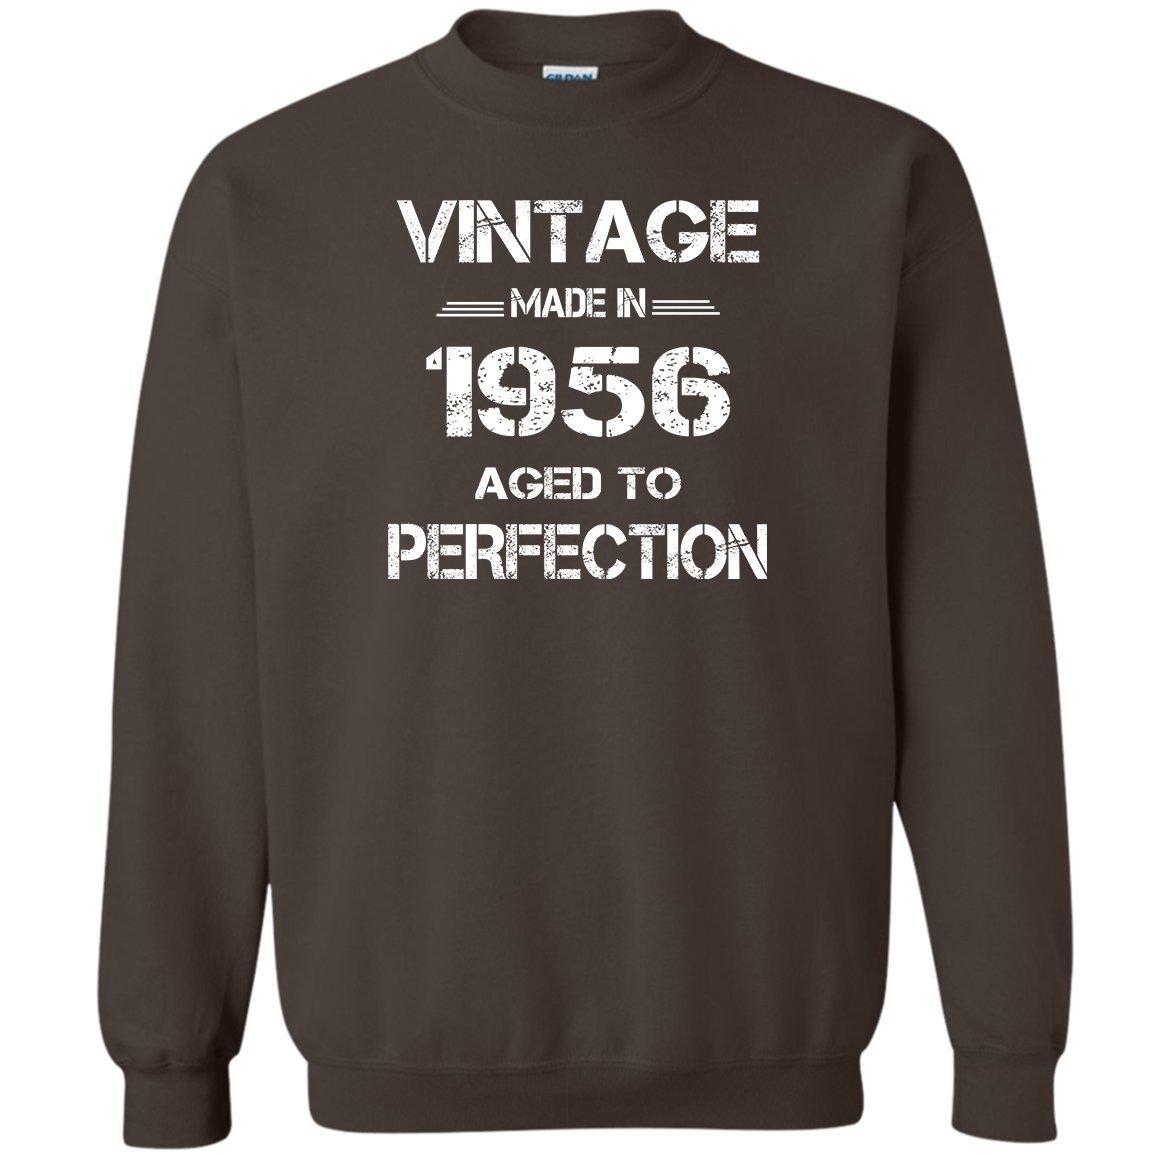 Kidoba Vintage Made In 1956 Aged To Perfect Shirt 1956 Vintage Sweatshirt